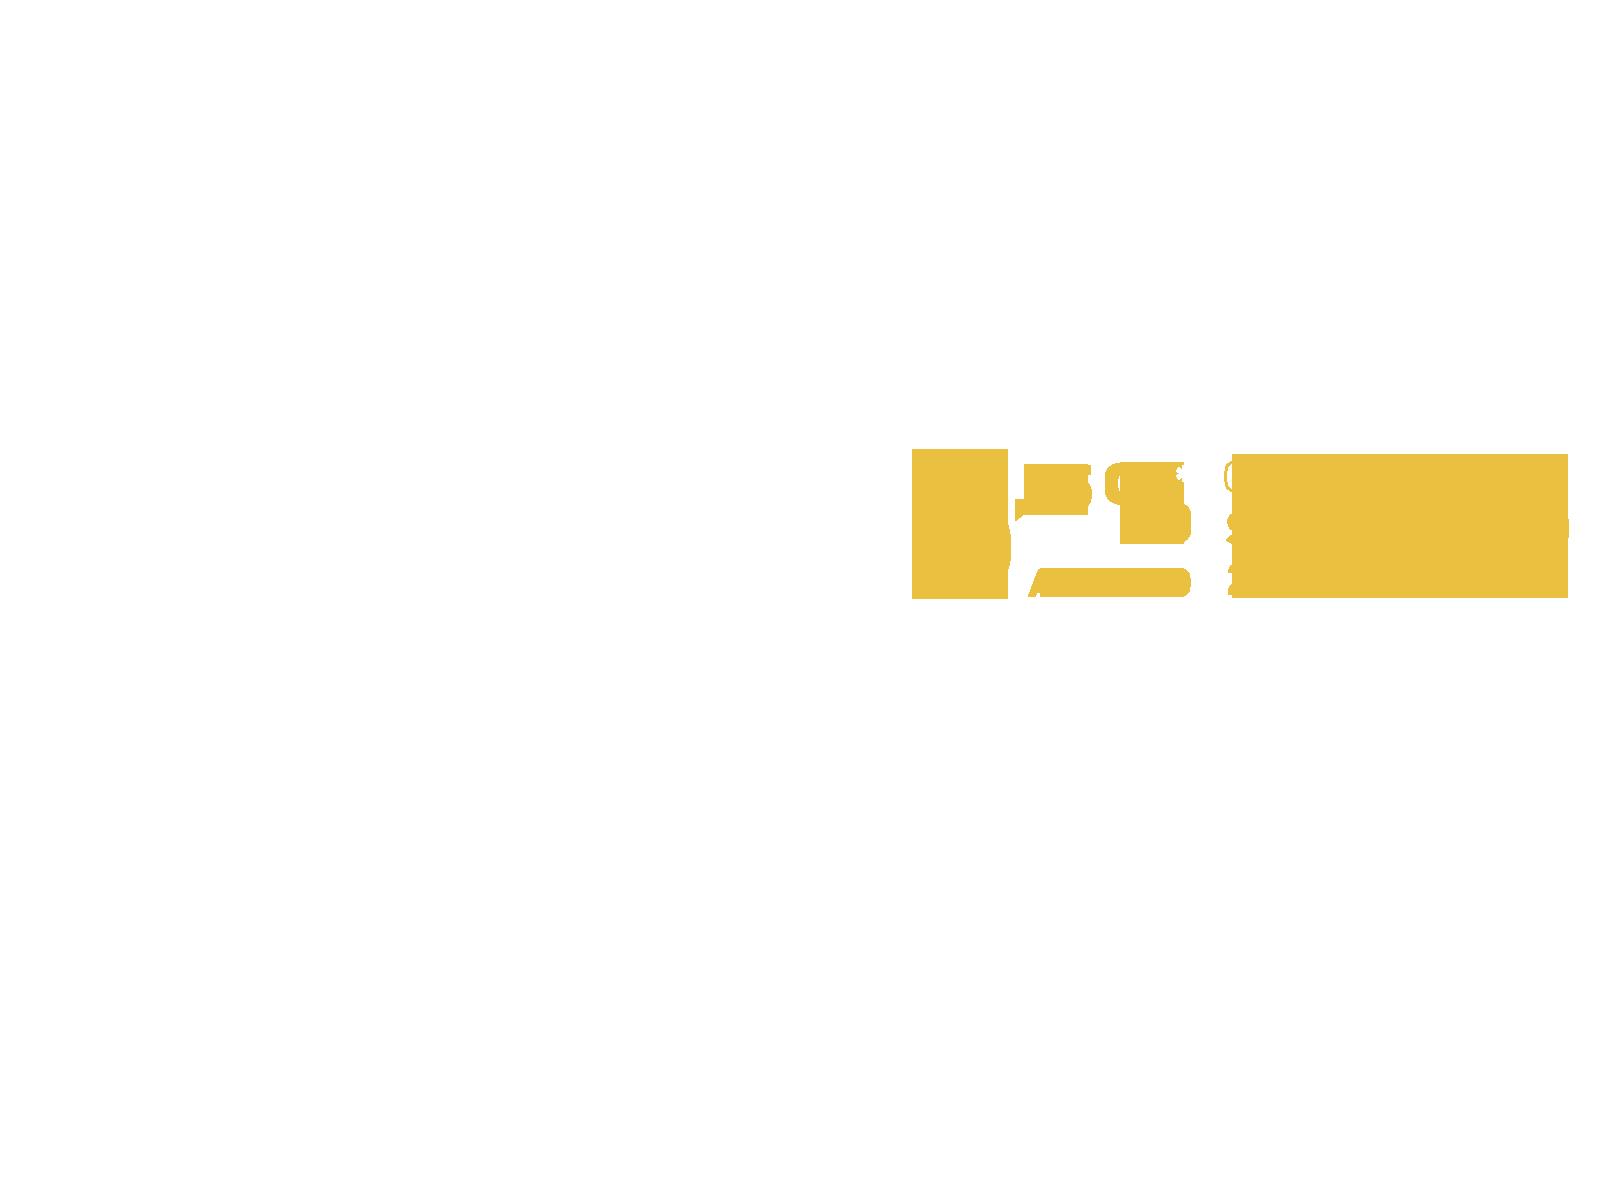 https://scpconteudos.pt/sites/default/files/revslider/image/emprestimo_texto.png